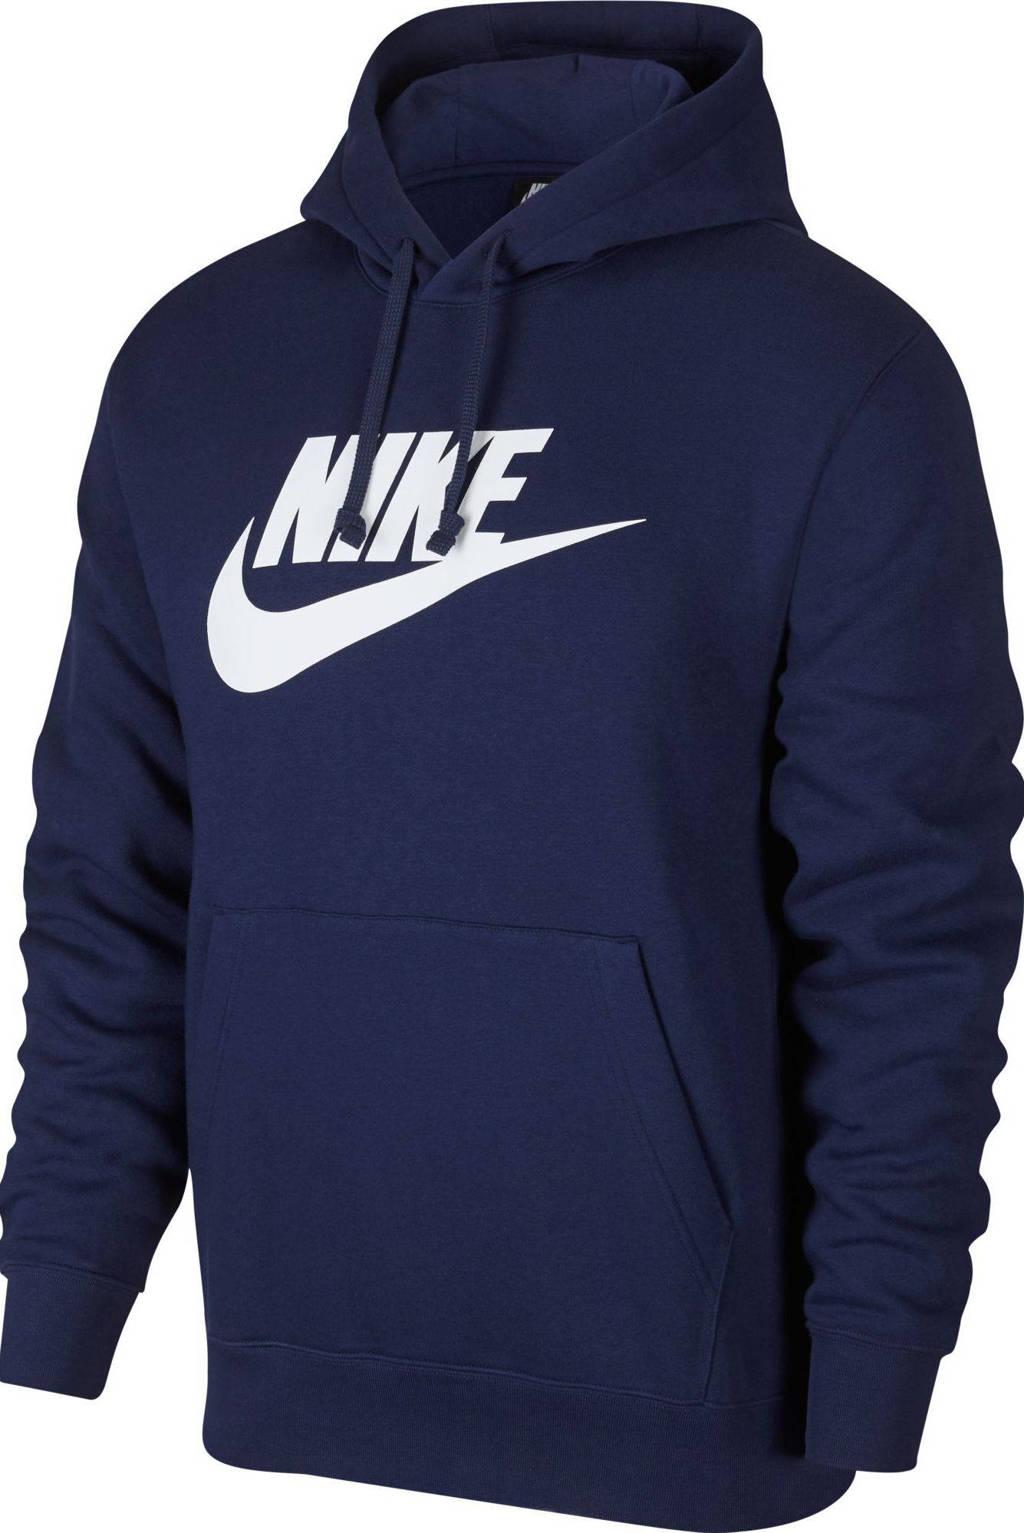 Nike hoodie donkerblauw/wit, Donkerblauw/wit